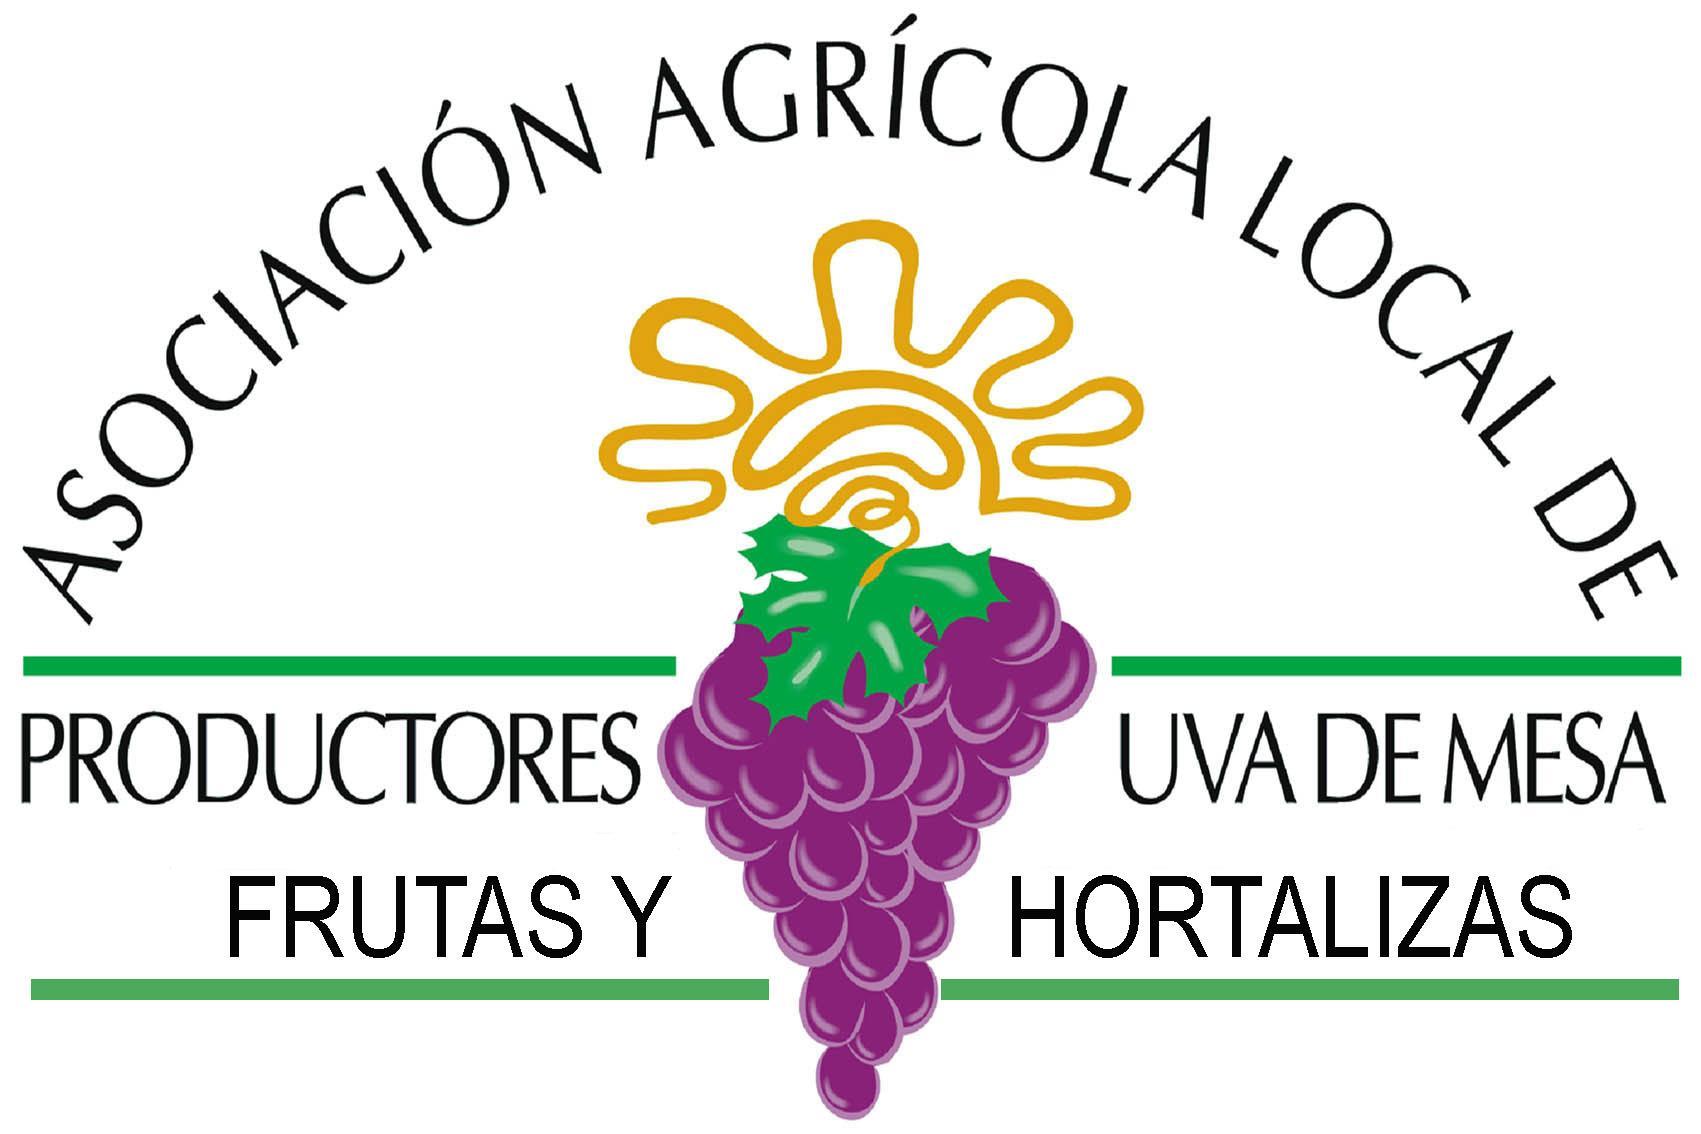 Asociaci n agr cola local de productores de uva de mesa for Asociacion de hortalizas